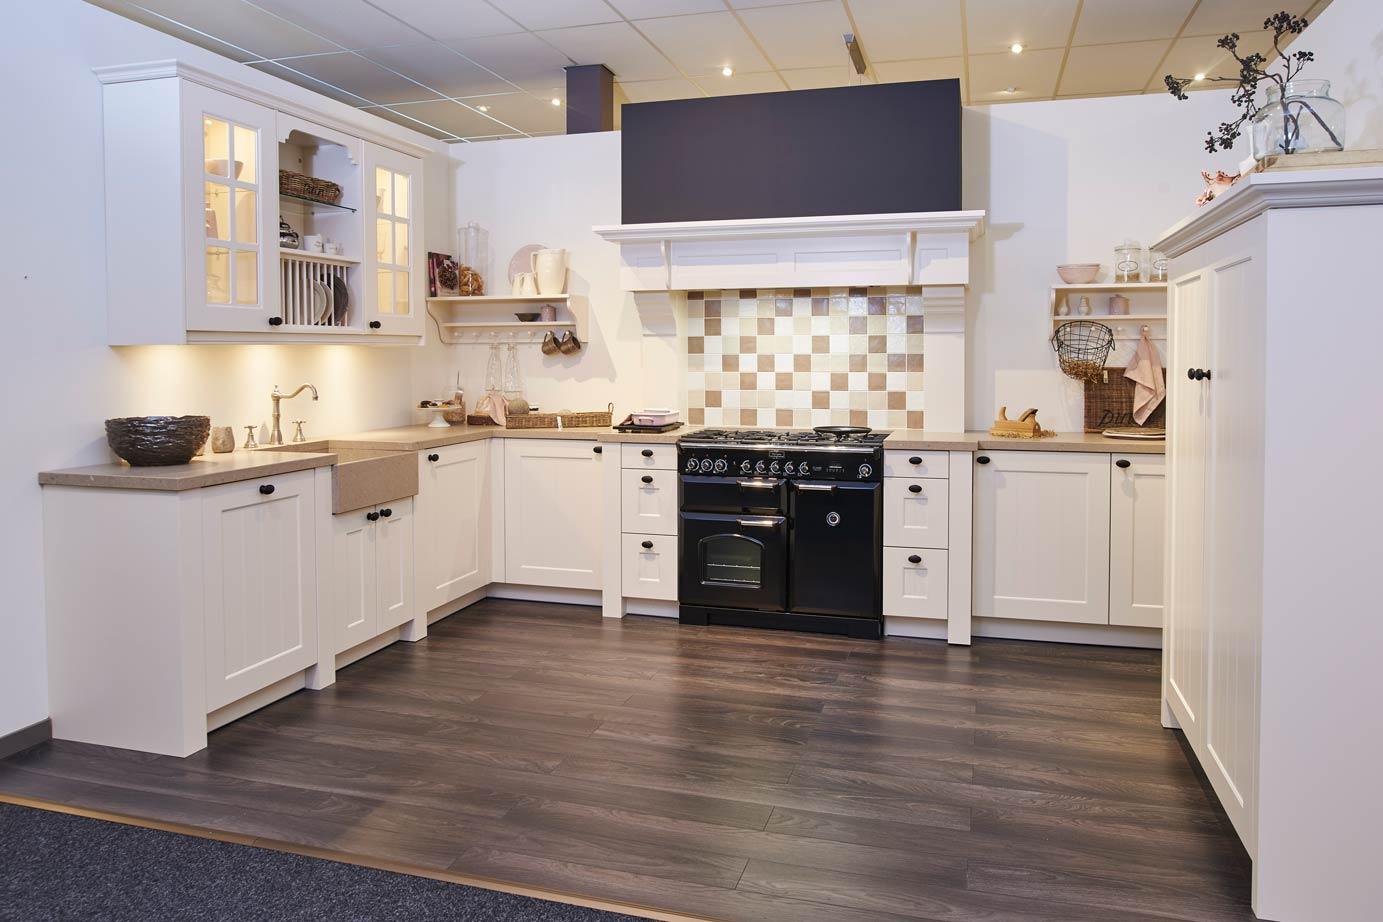 Goedkope Design Keukens : Landelijke keuken DB Keukens